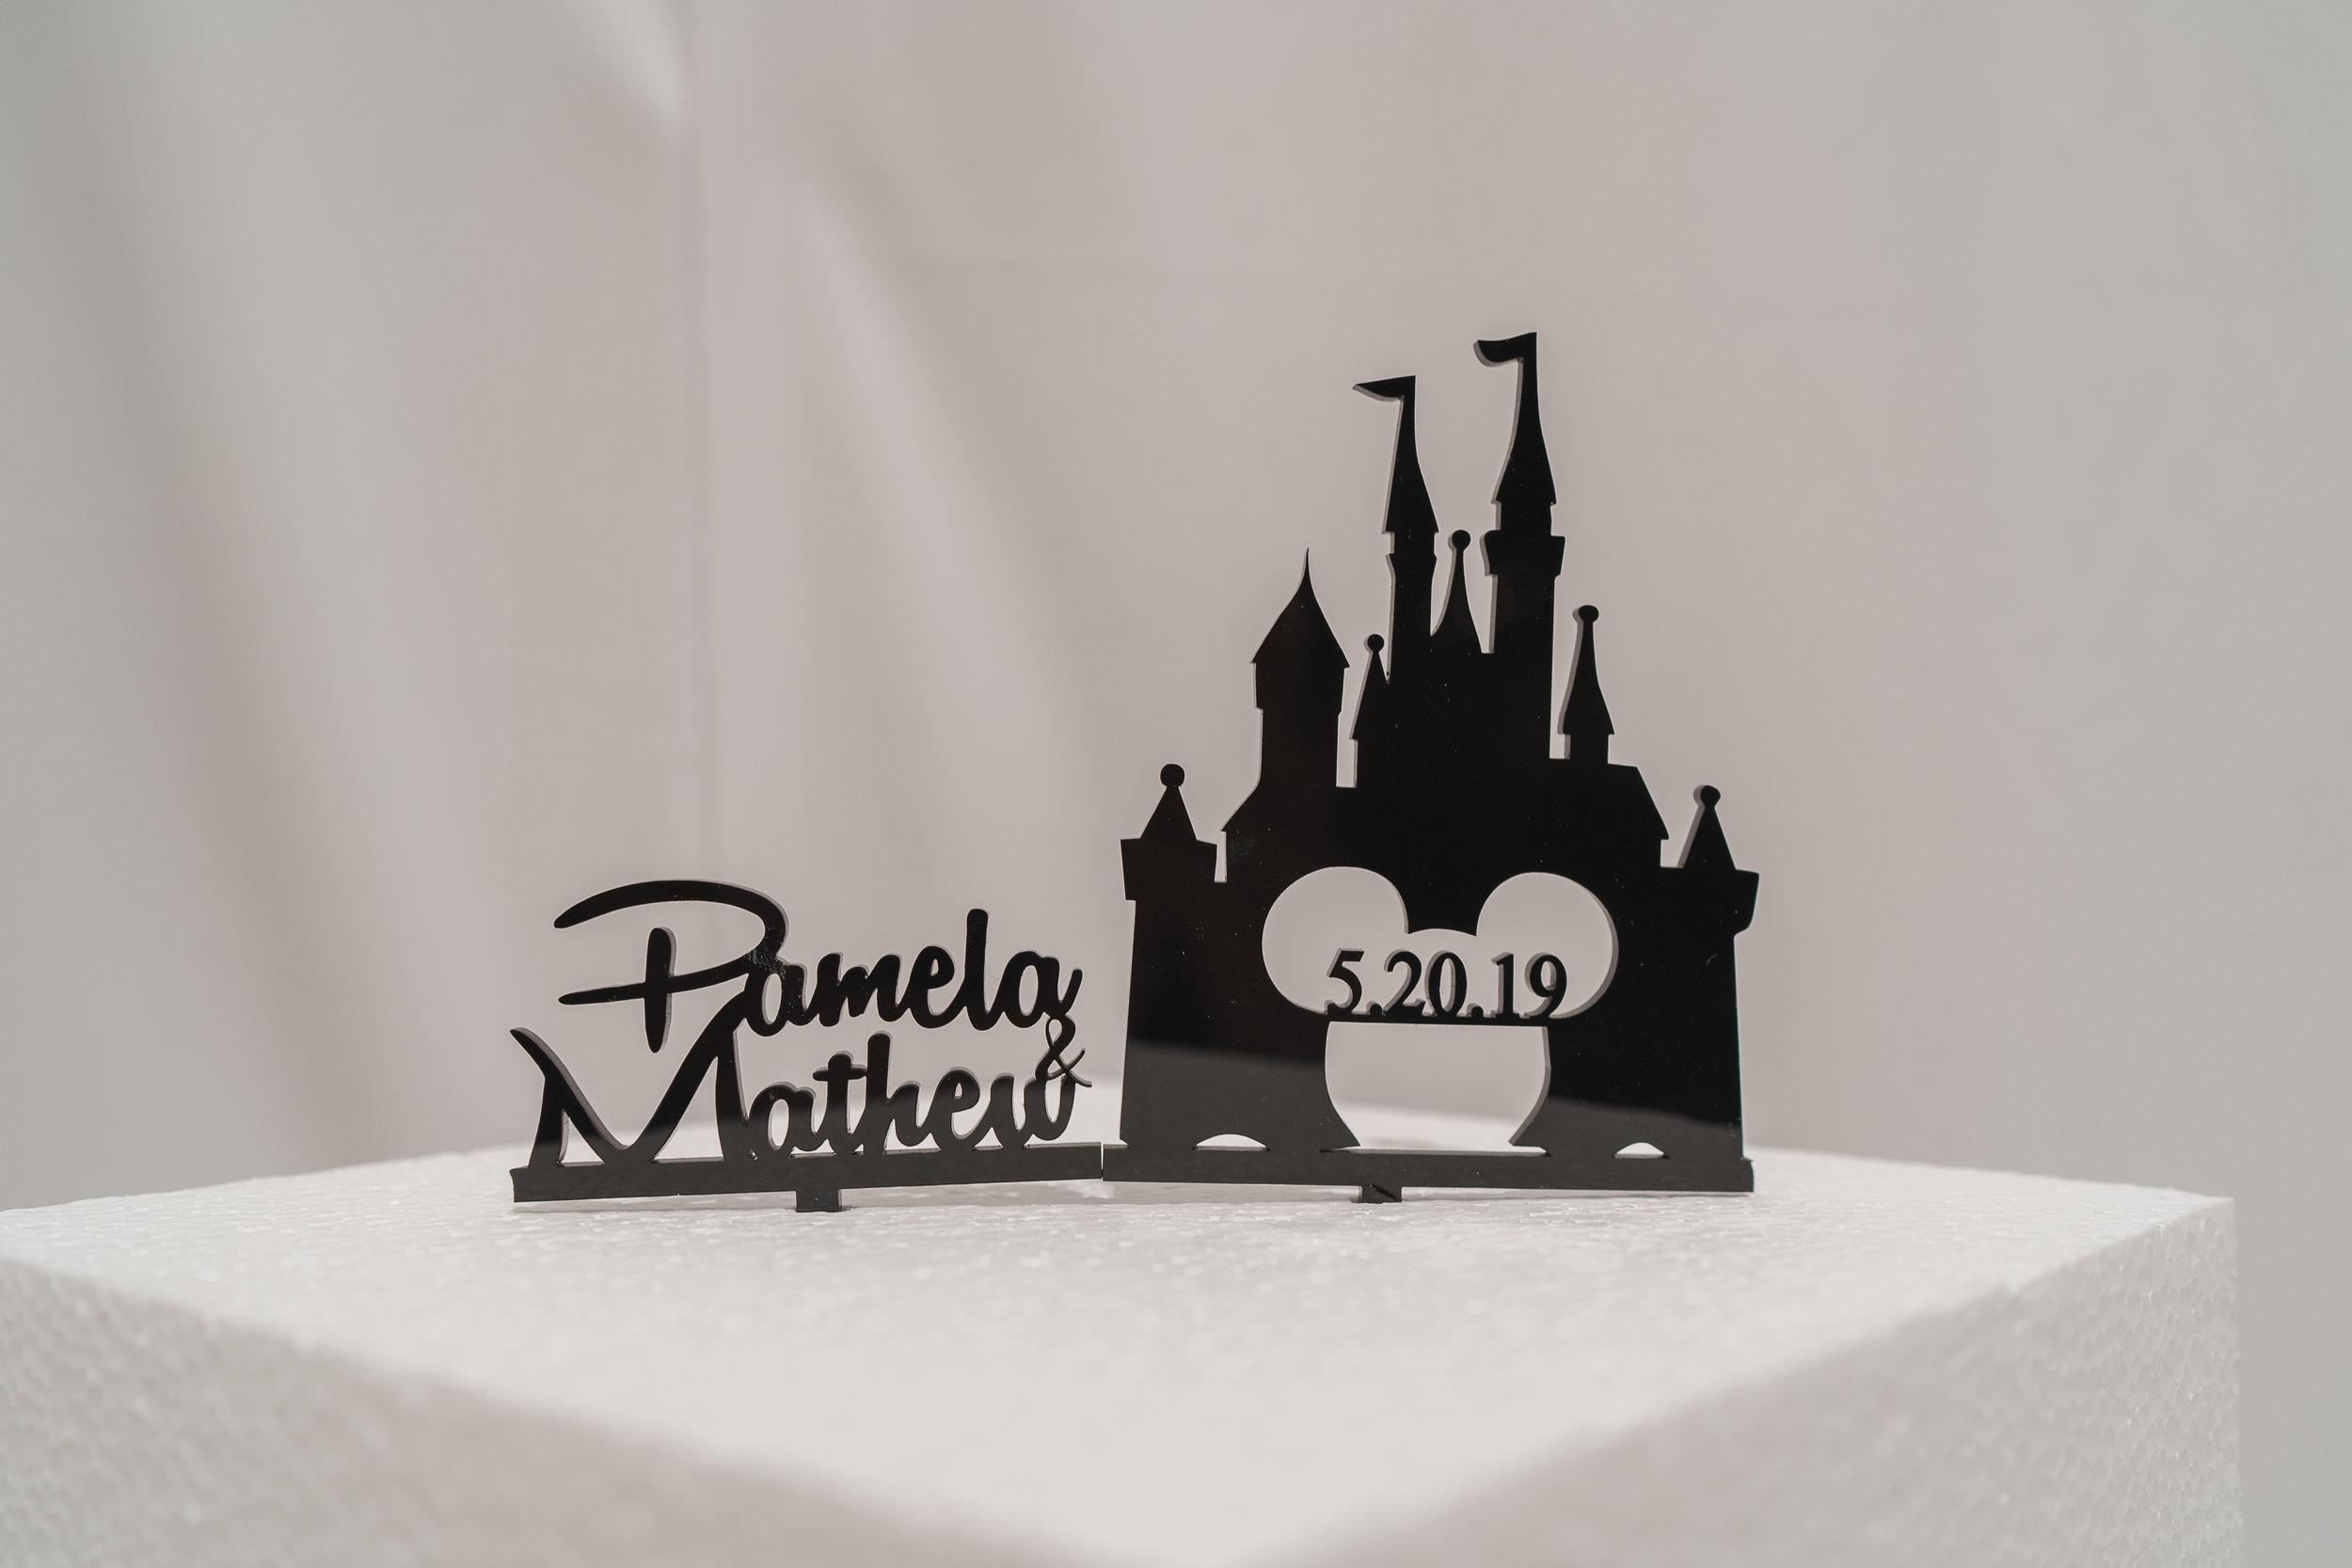 20190520 - Pamela & Matthew Wedding- 0421.jpg